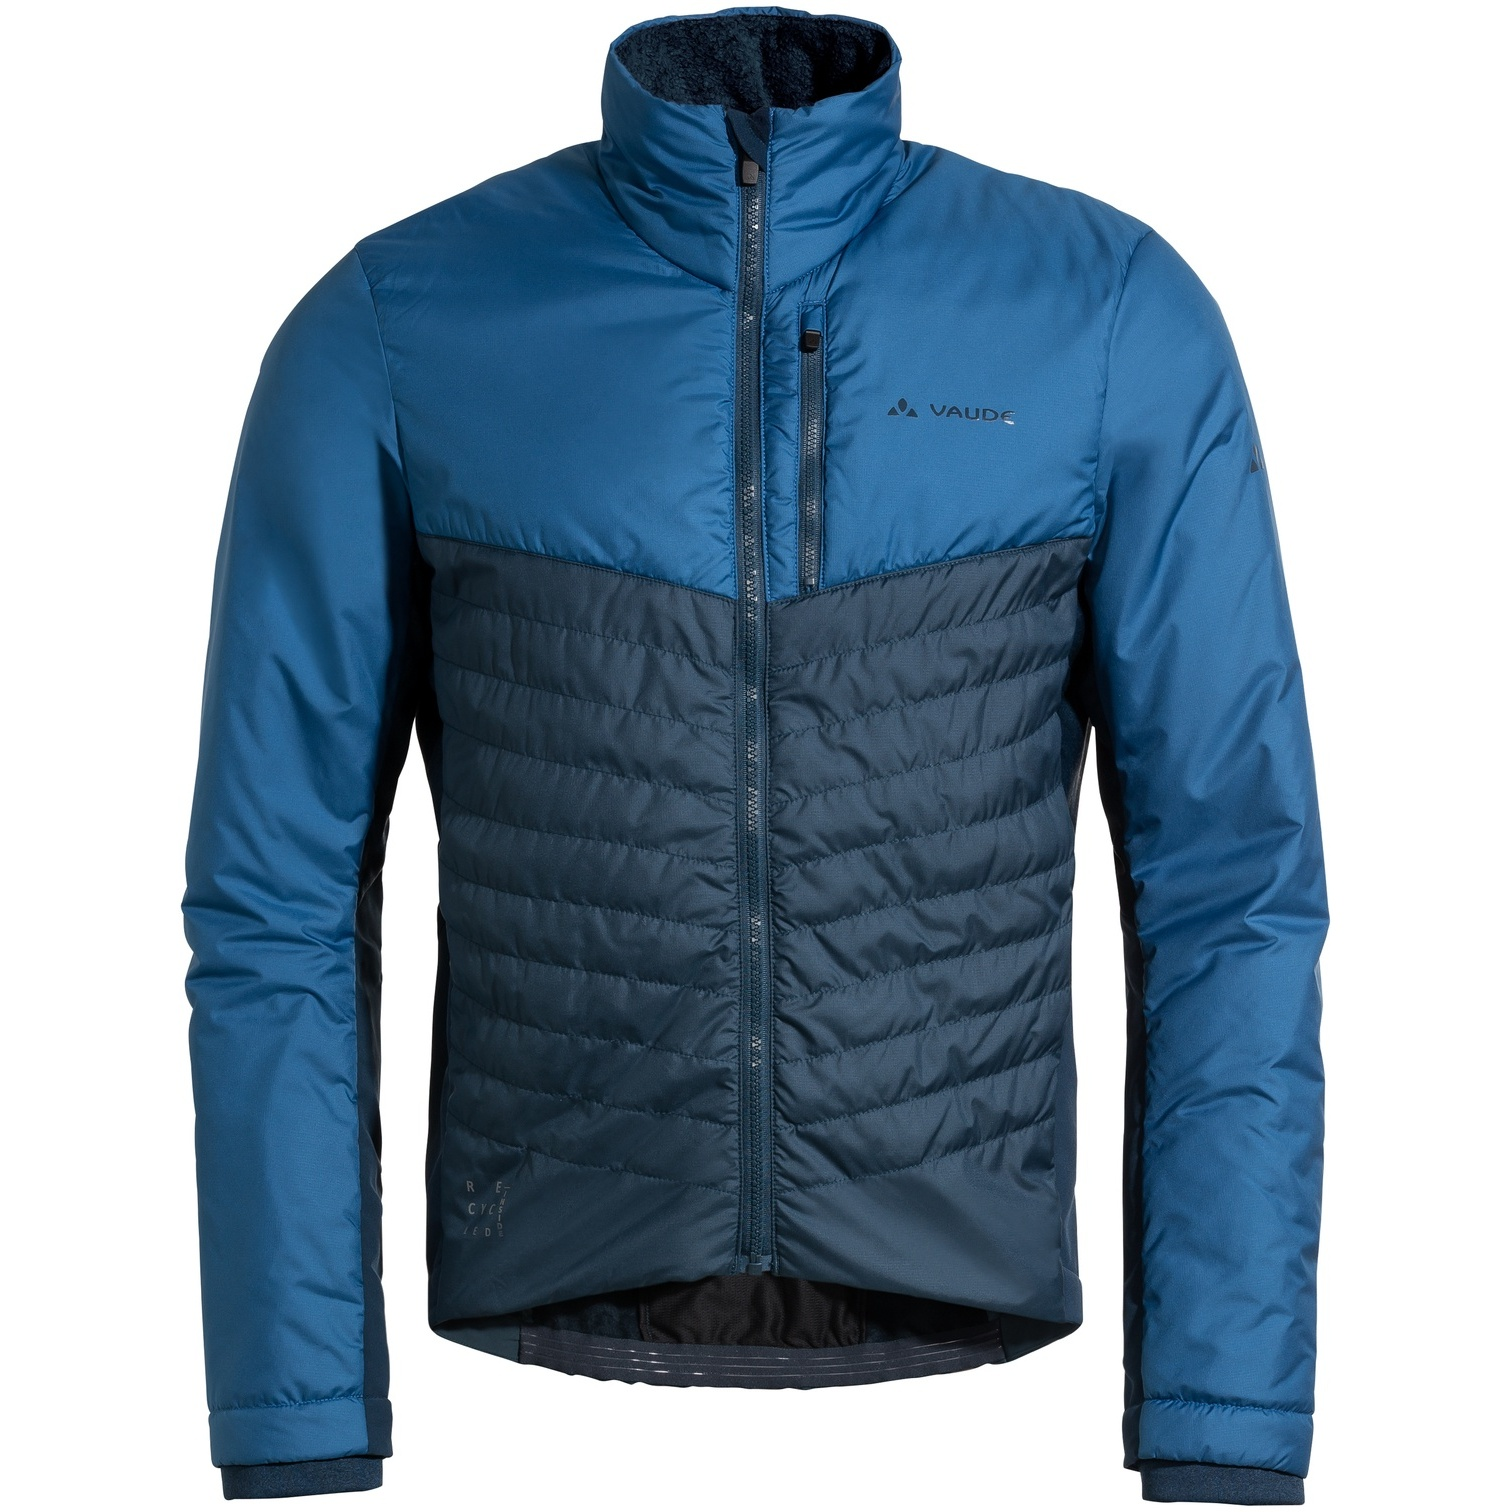 Image of Vaude Men's Posta Insulation Jacket - ultramarine